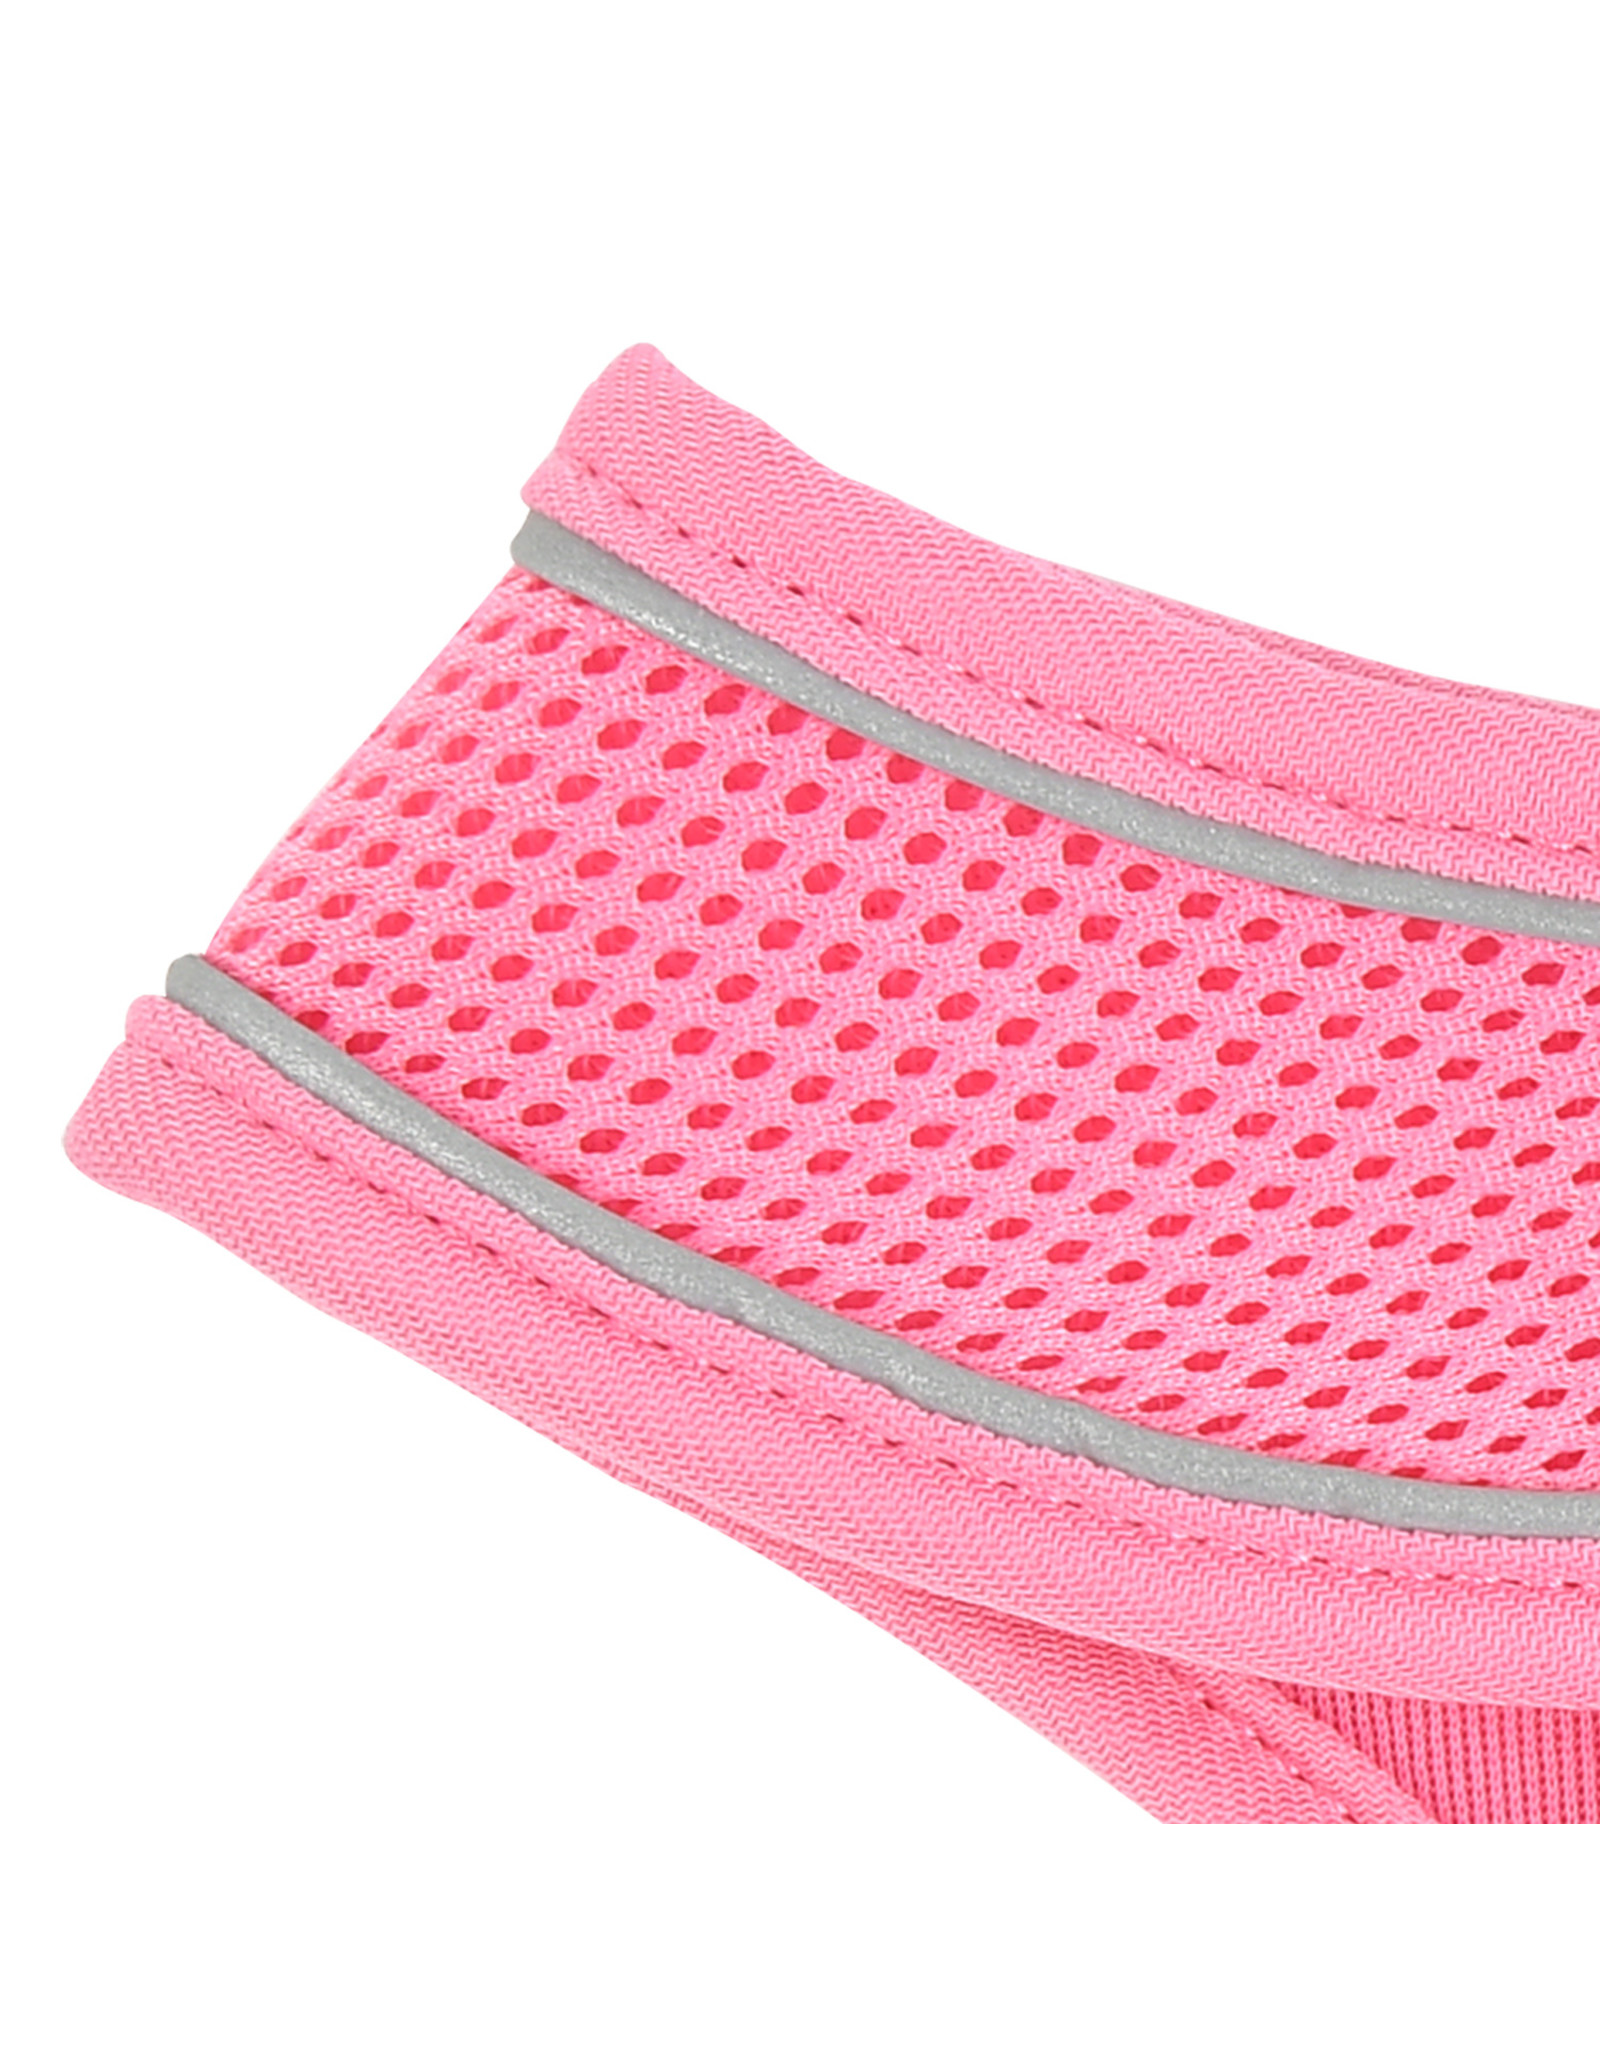 Puppia Puppia Soft Harness PRO model A Pink